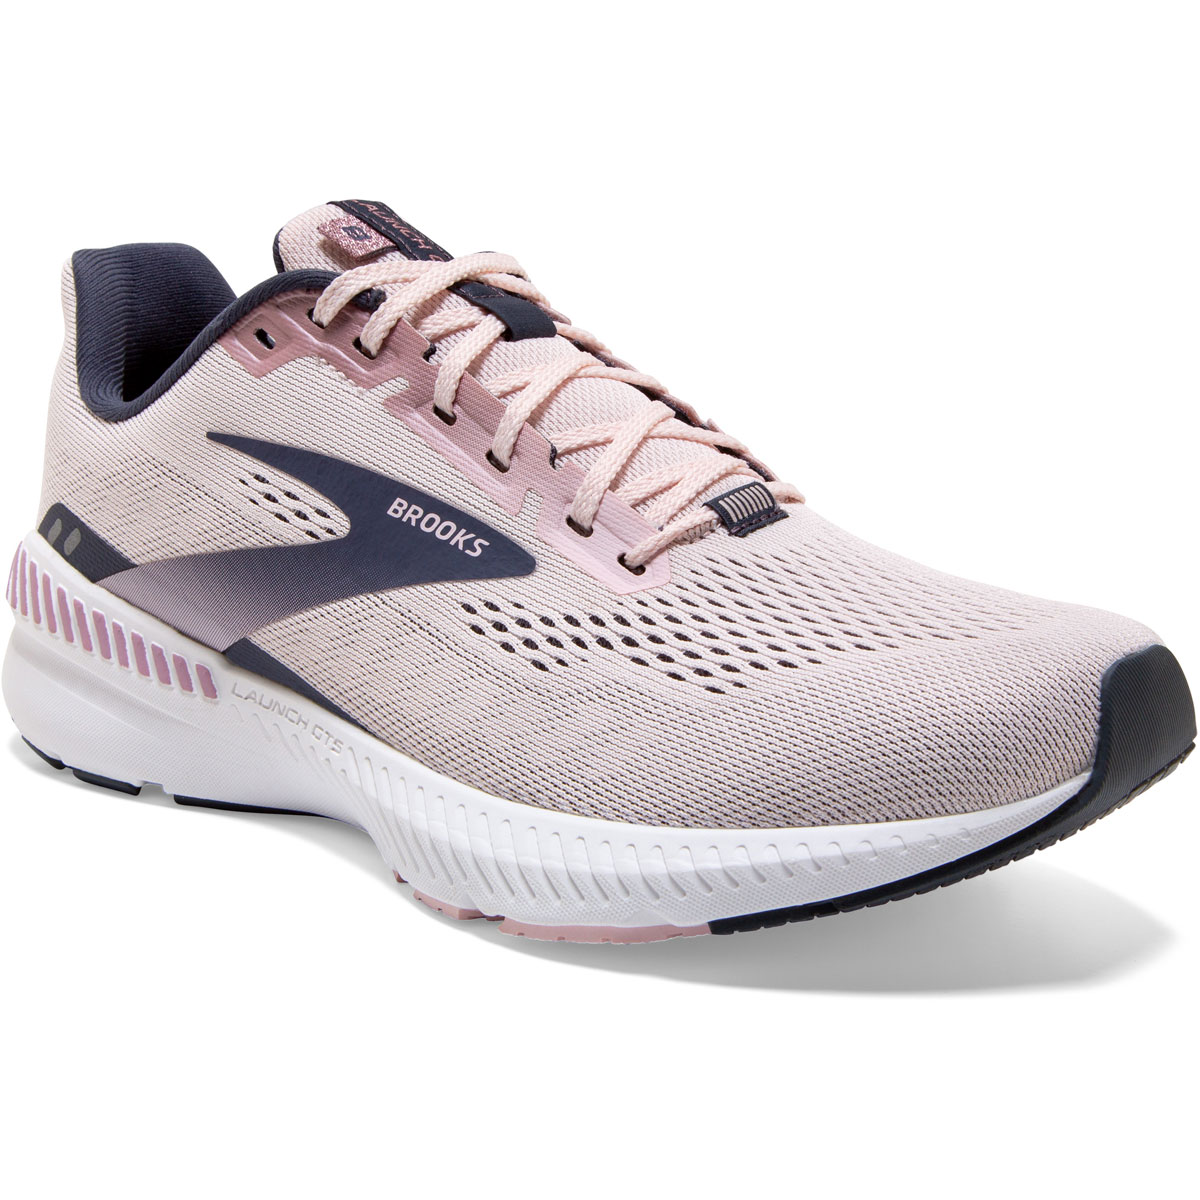 Women's Brooks Launch GTS 8 Running Shoe - Color: Primrose/Ombre - Size: 5 - Width: Regular, Primrose/Ombre, large, image 6